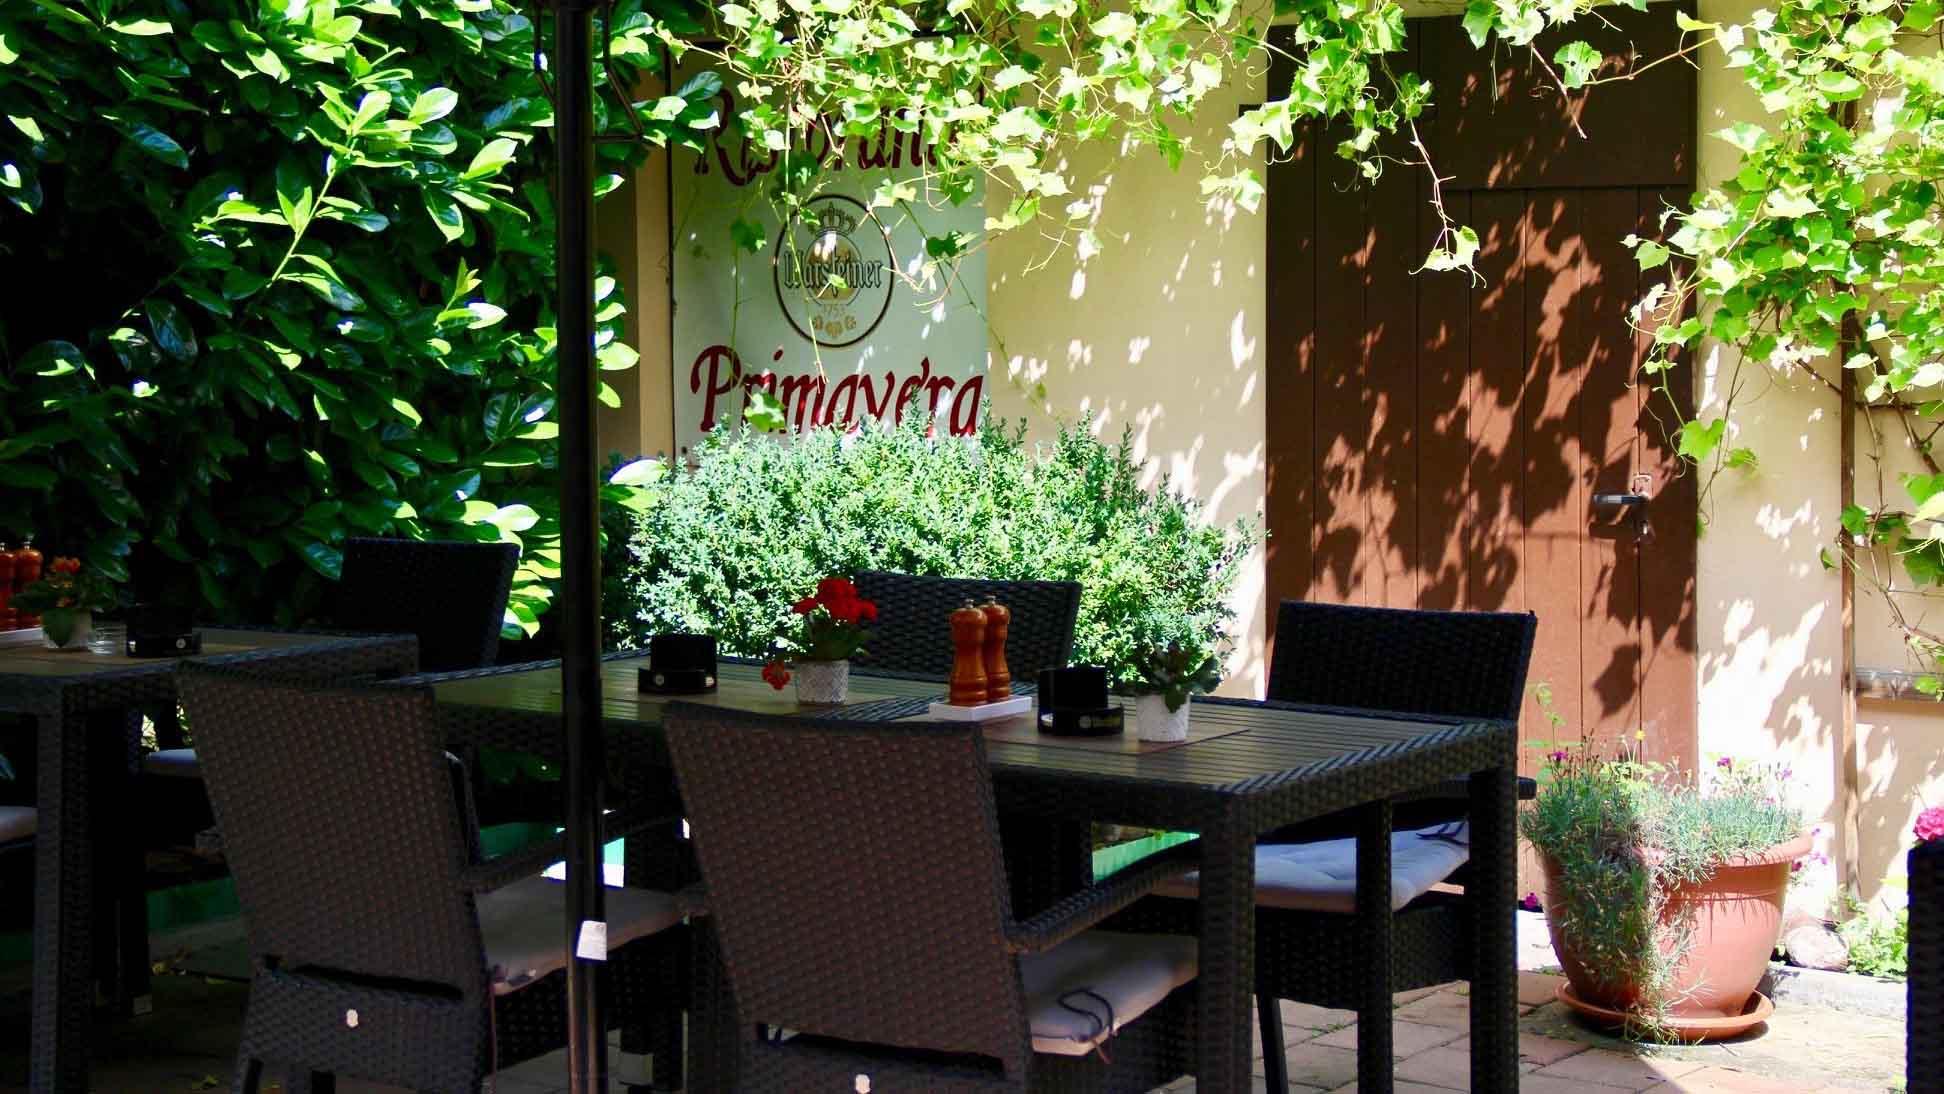 celle-restaurant-primavera-innenhof